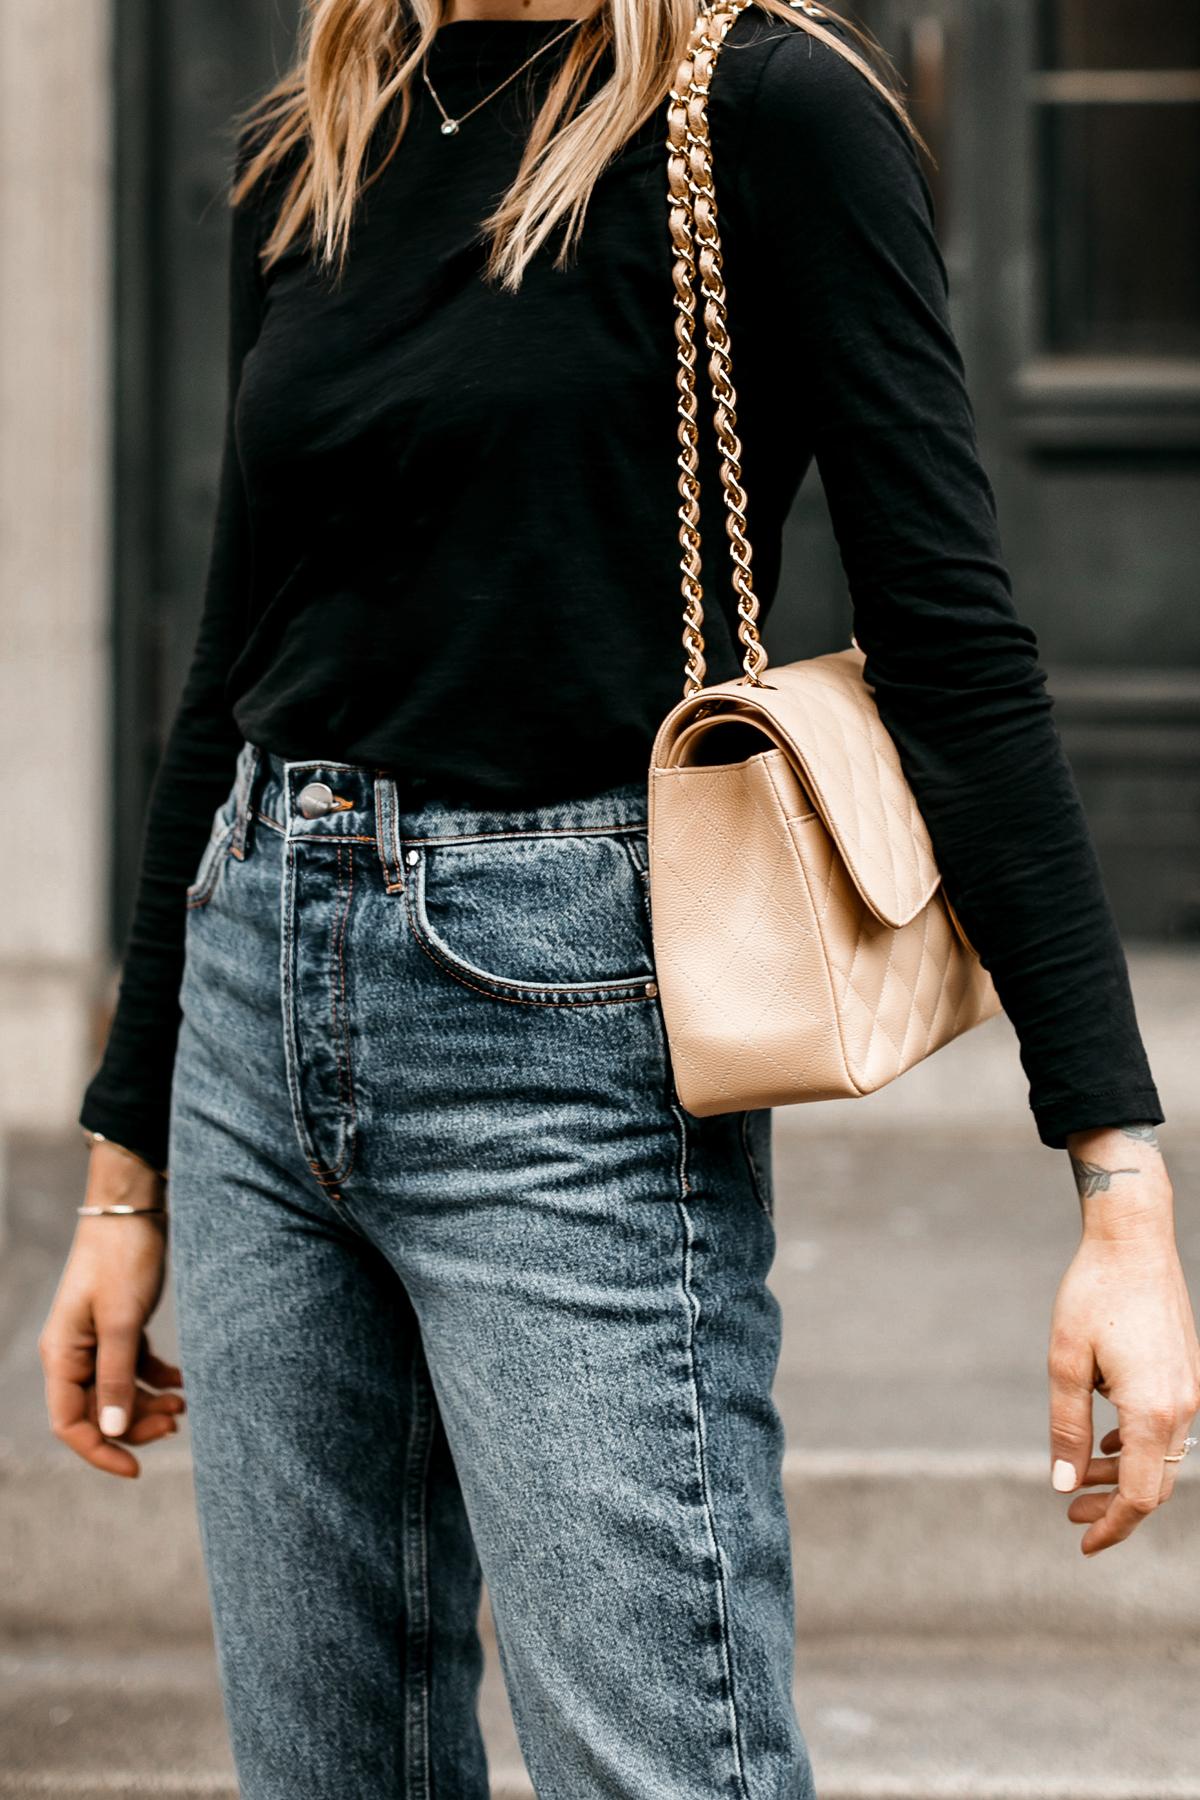 Fashion Jackson Wearing Madewell Black Long Sleeve Tshirt Anine Bing Jeans Beige Chanel Handbag